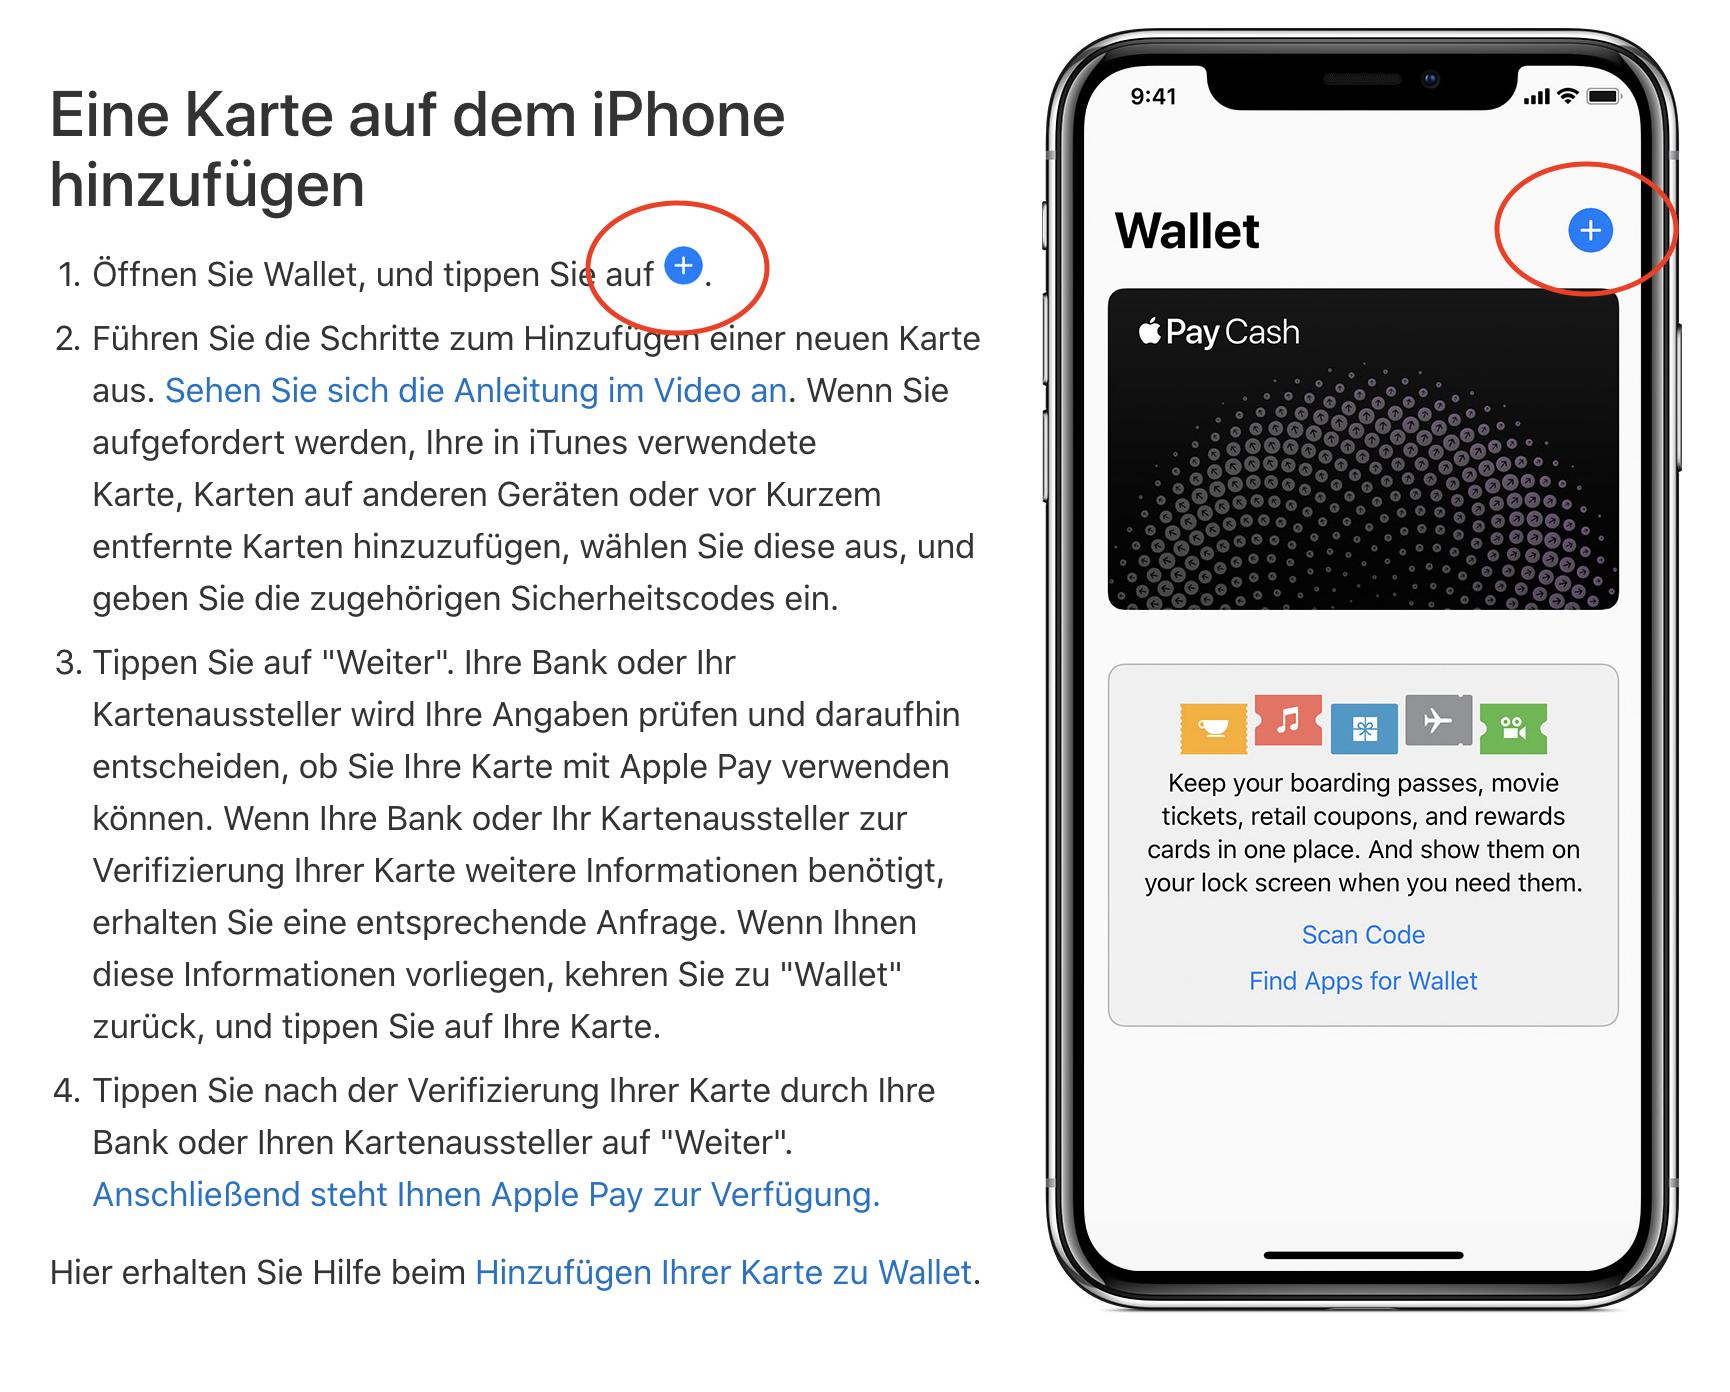 apple-business-chat-messenger-apple-pay-deutschland-karte-hinzufugen